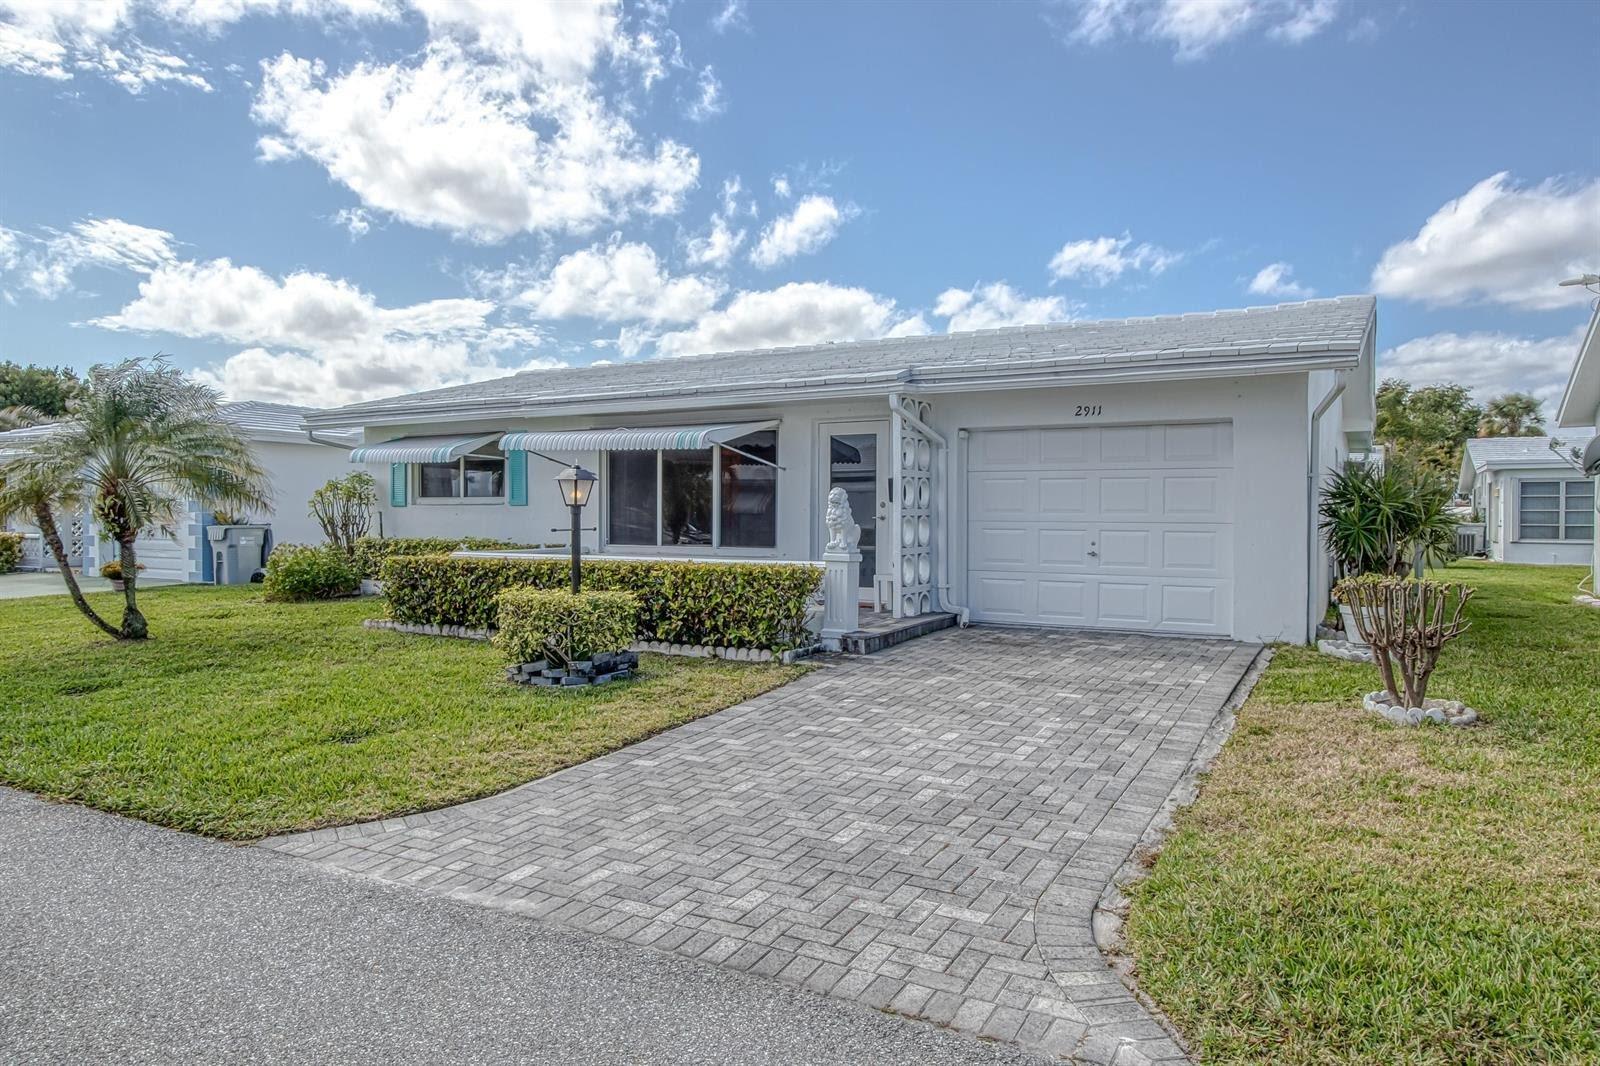 2911 NW 1st Dr Pompano Beach, FL 33064, USA